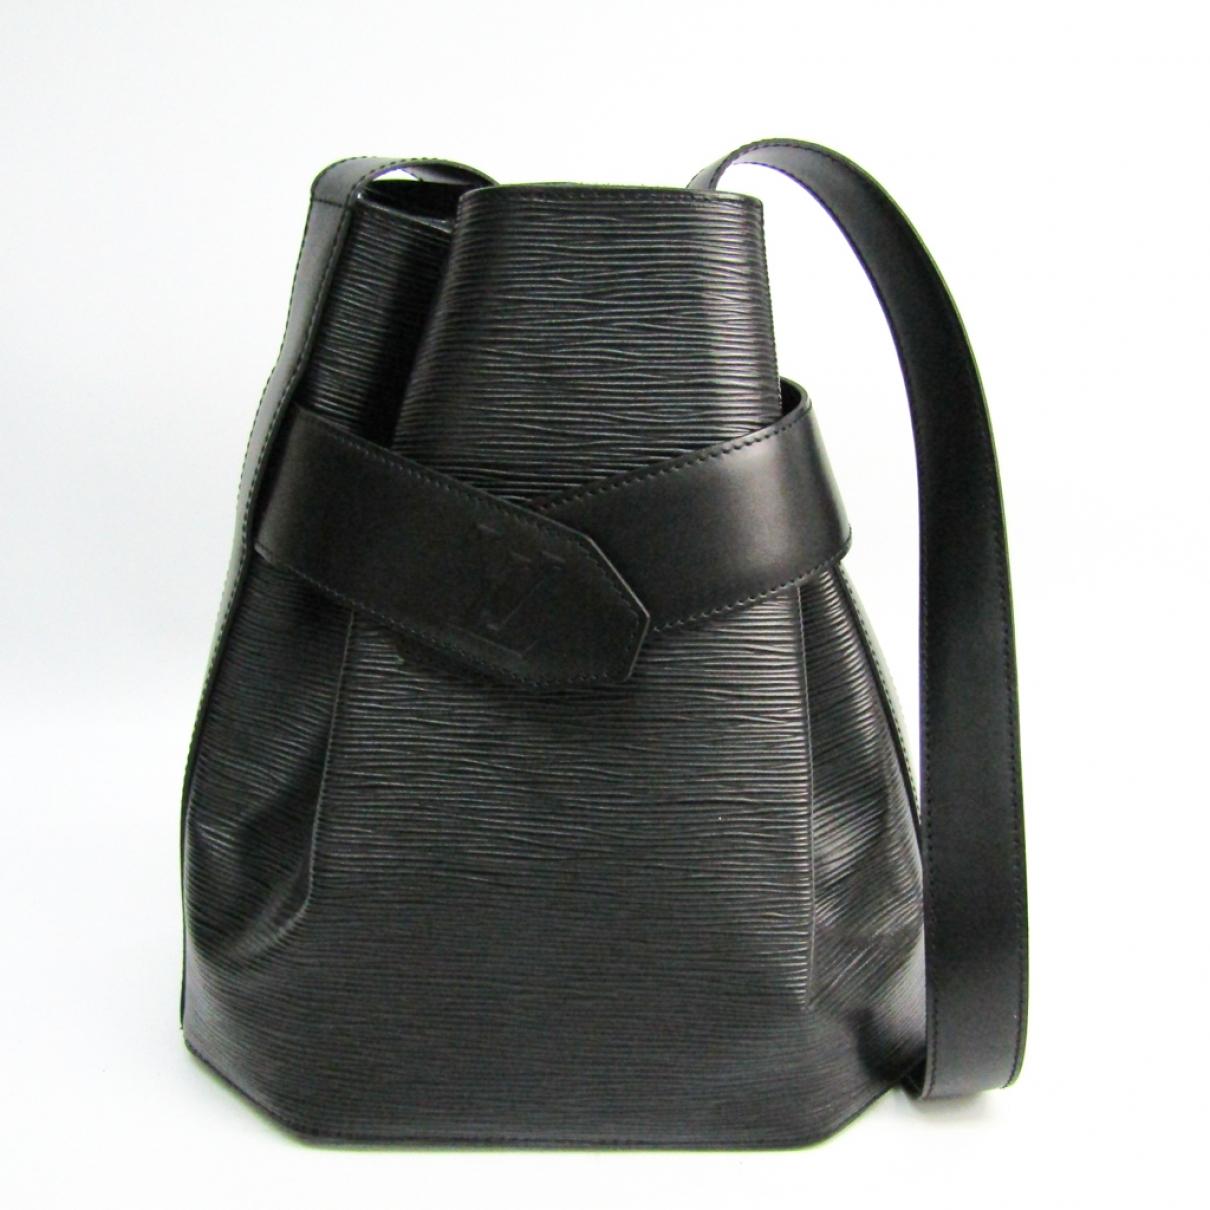 Louis Vuitton Sac d'épaule Black Leather handbag for Women \N